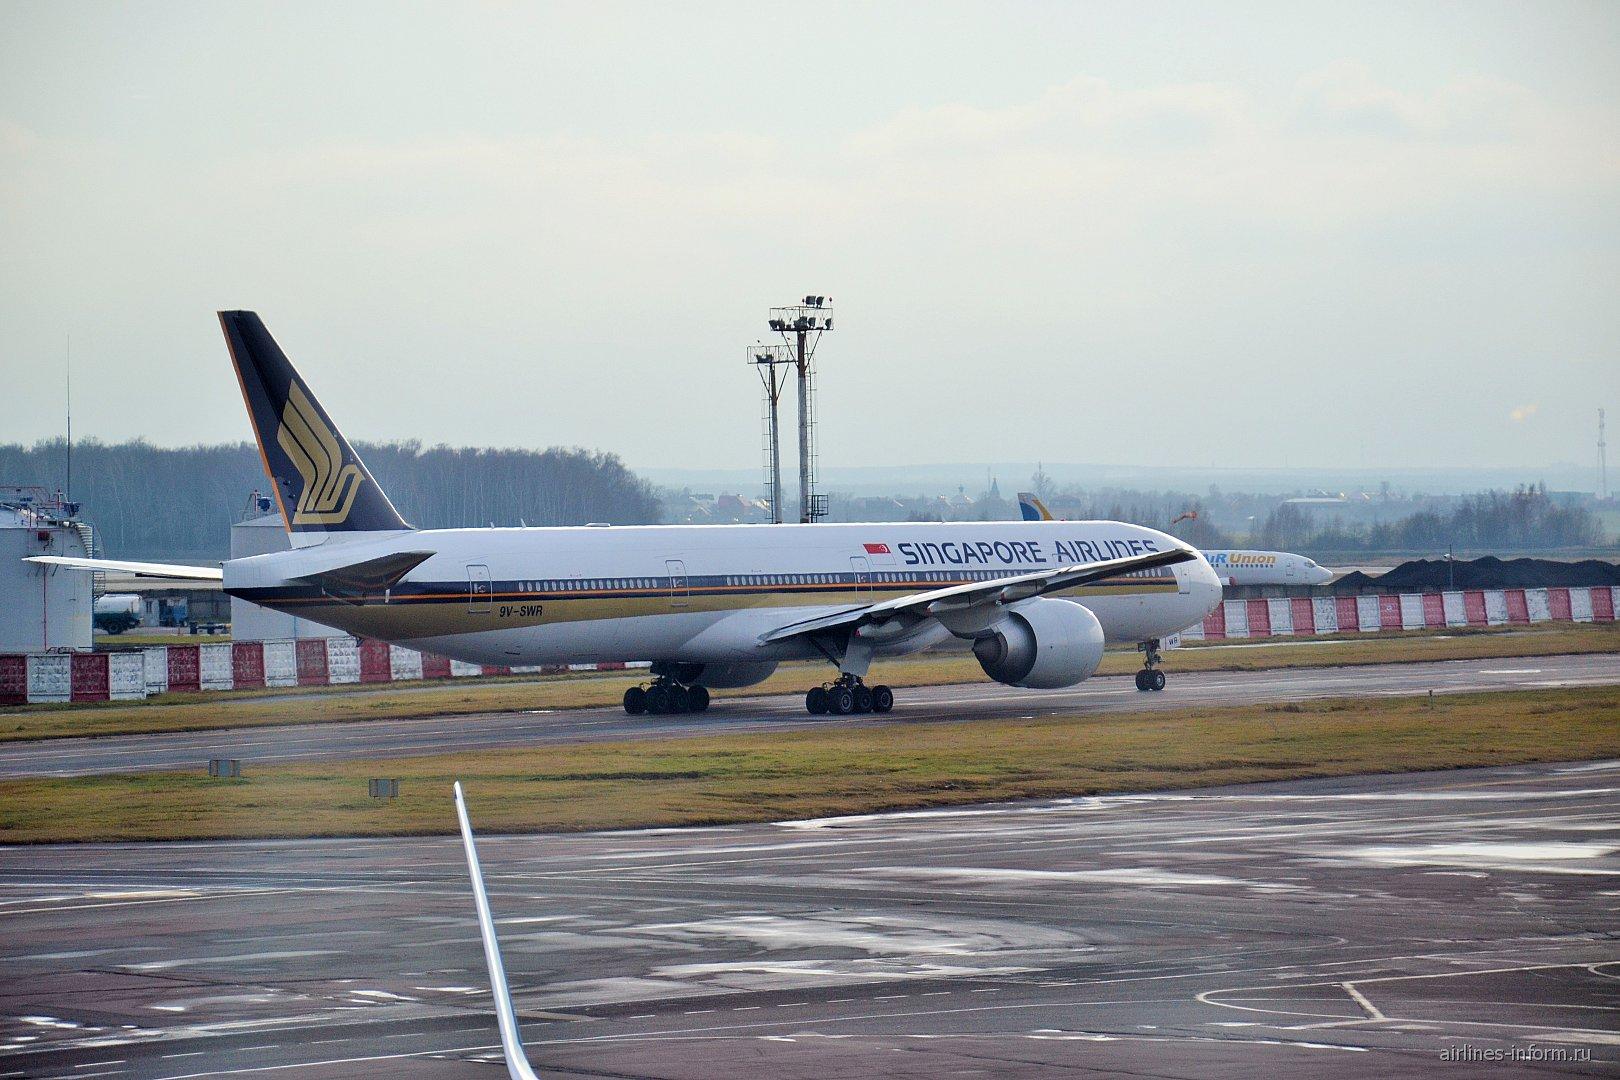 Боинг-777-300 Сингапурских авиалиний в аэропорту Домодедово